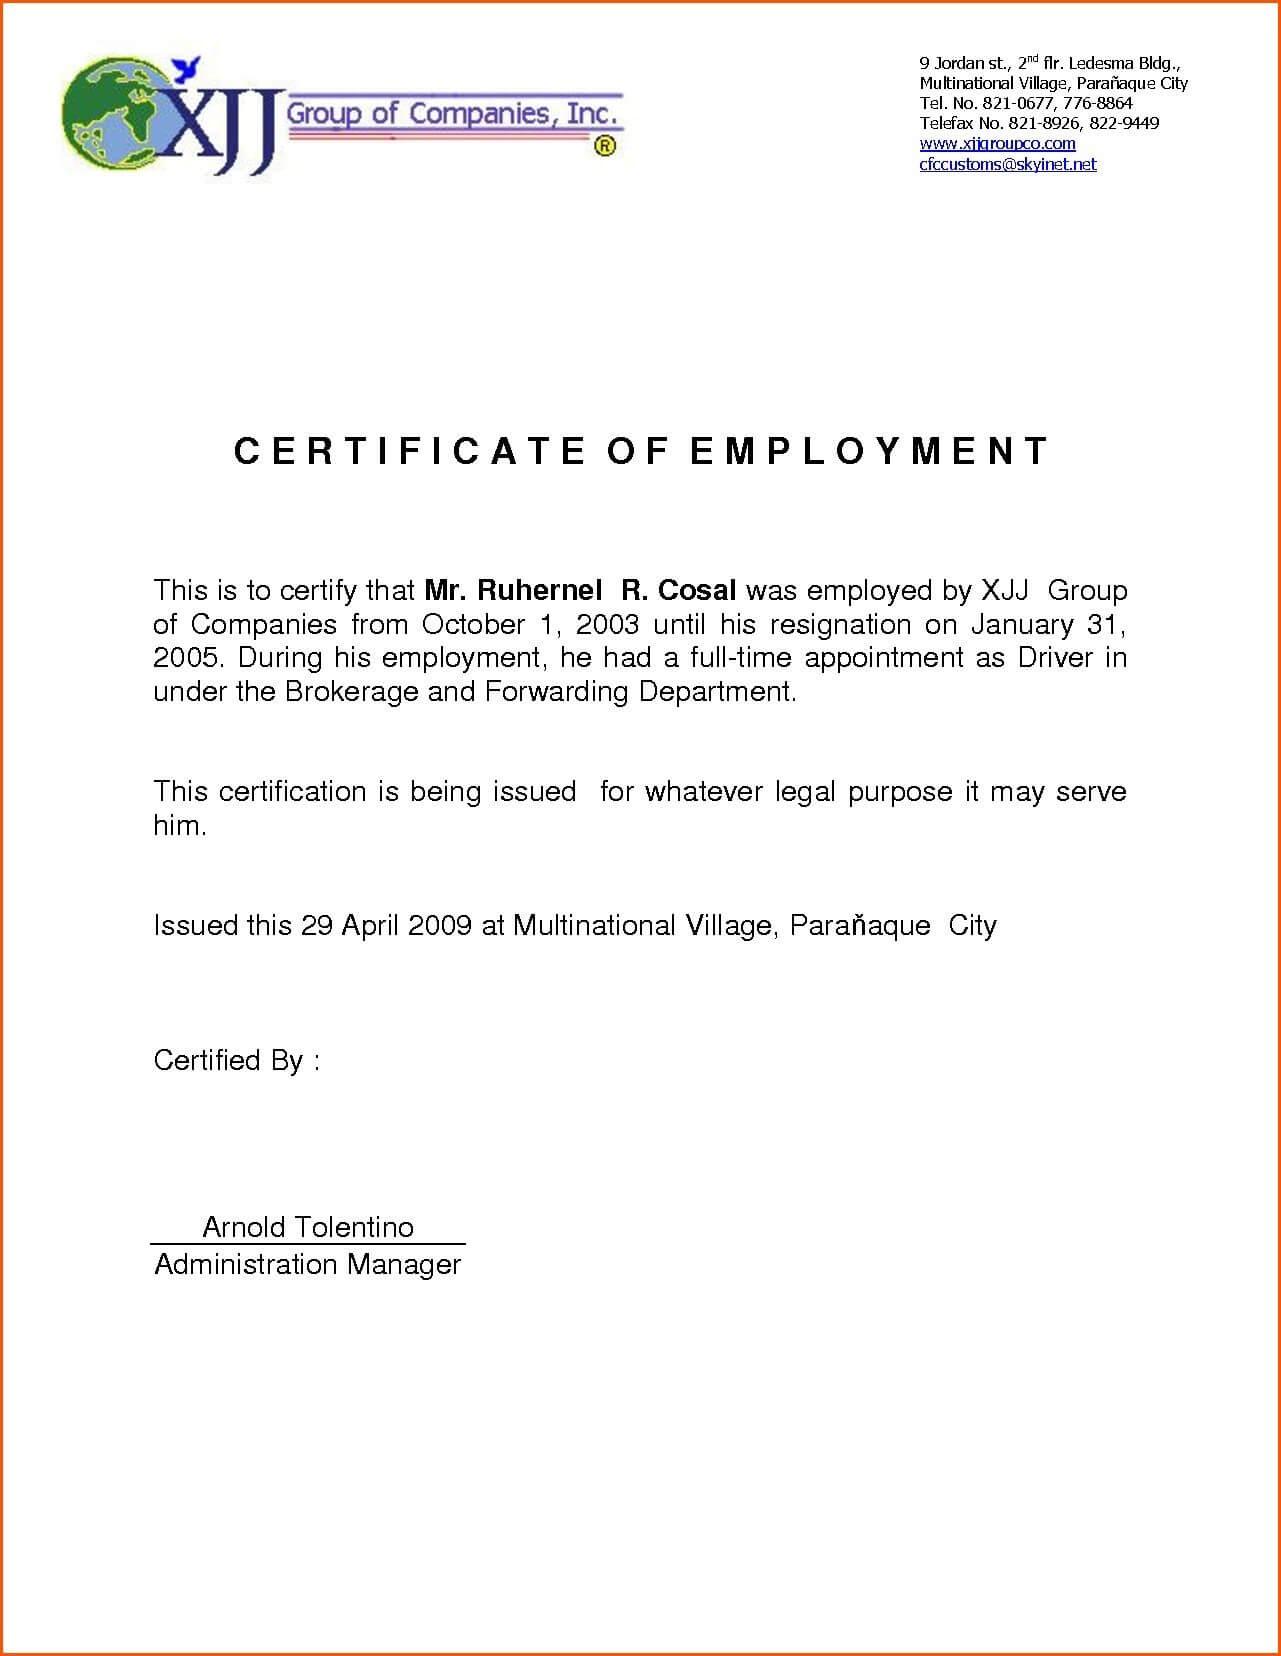 Certificates: Stunning Certificate Of Employment Template Intended For Template Of Certificate Of Employment